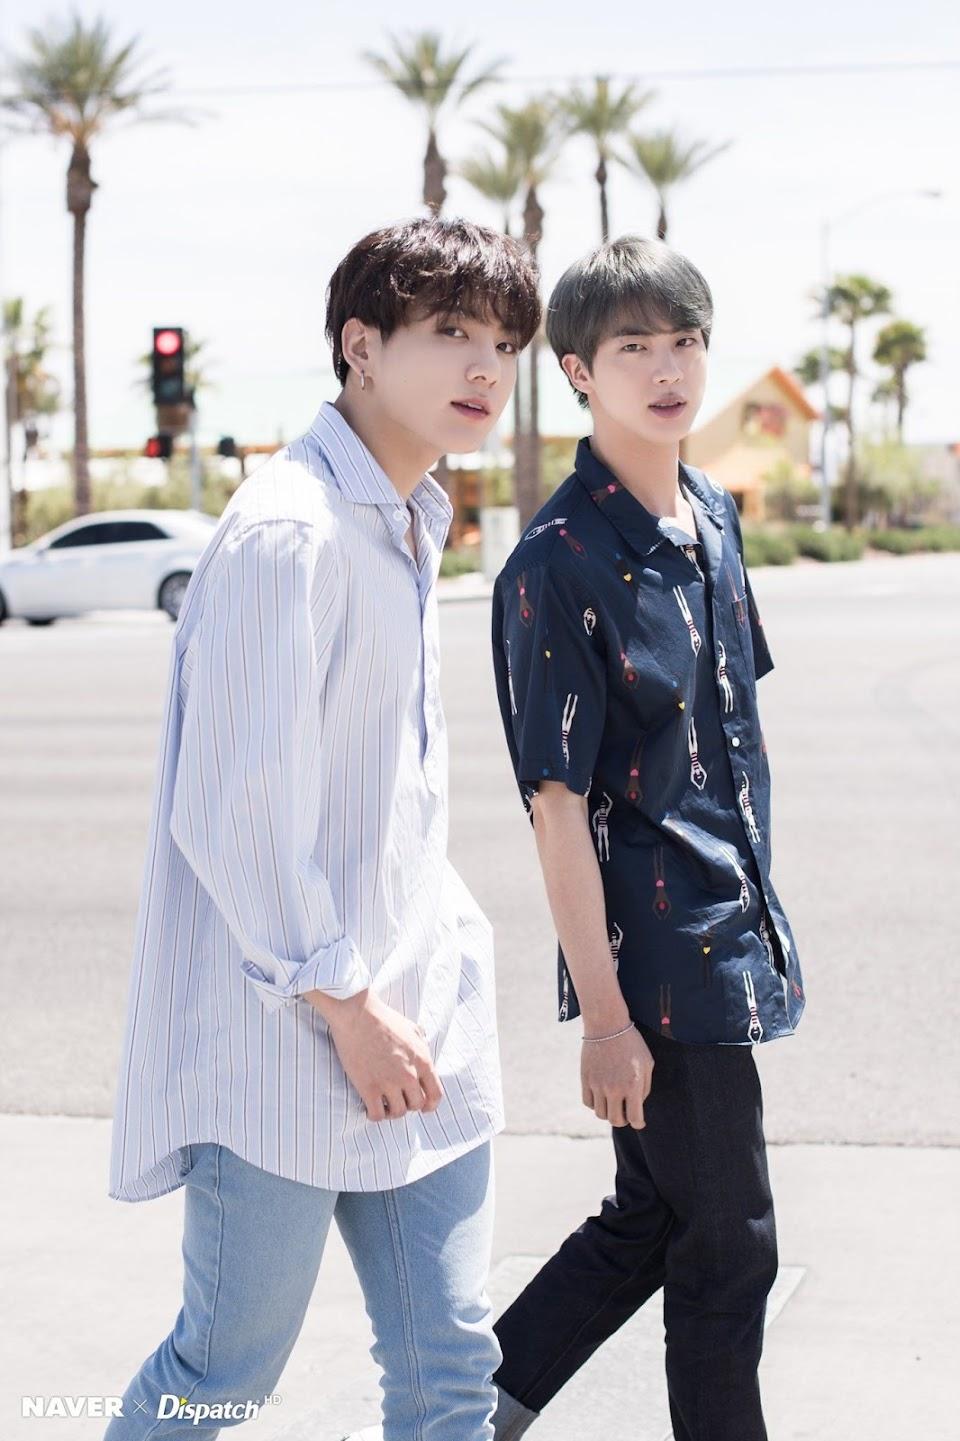 jin and jungkook